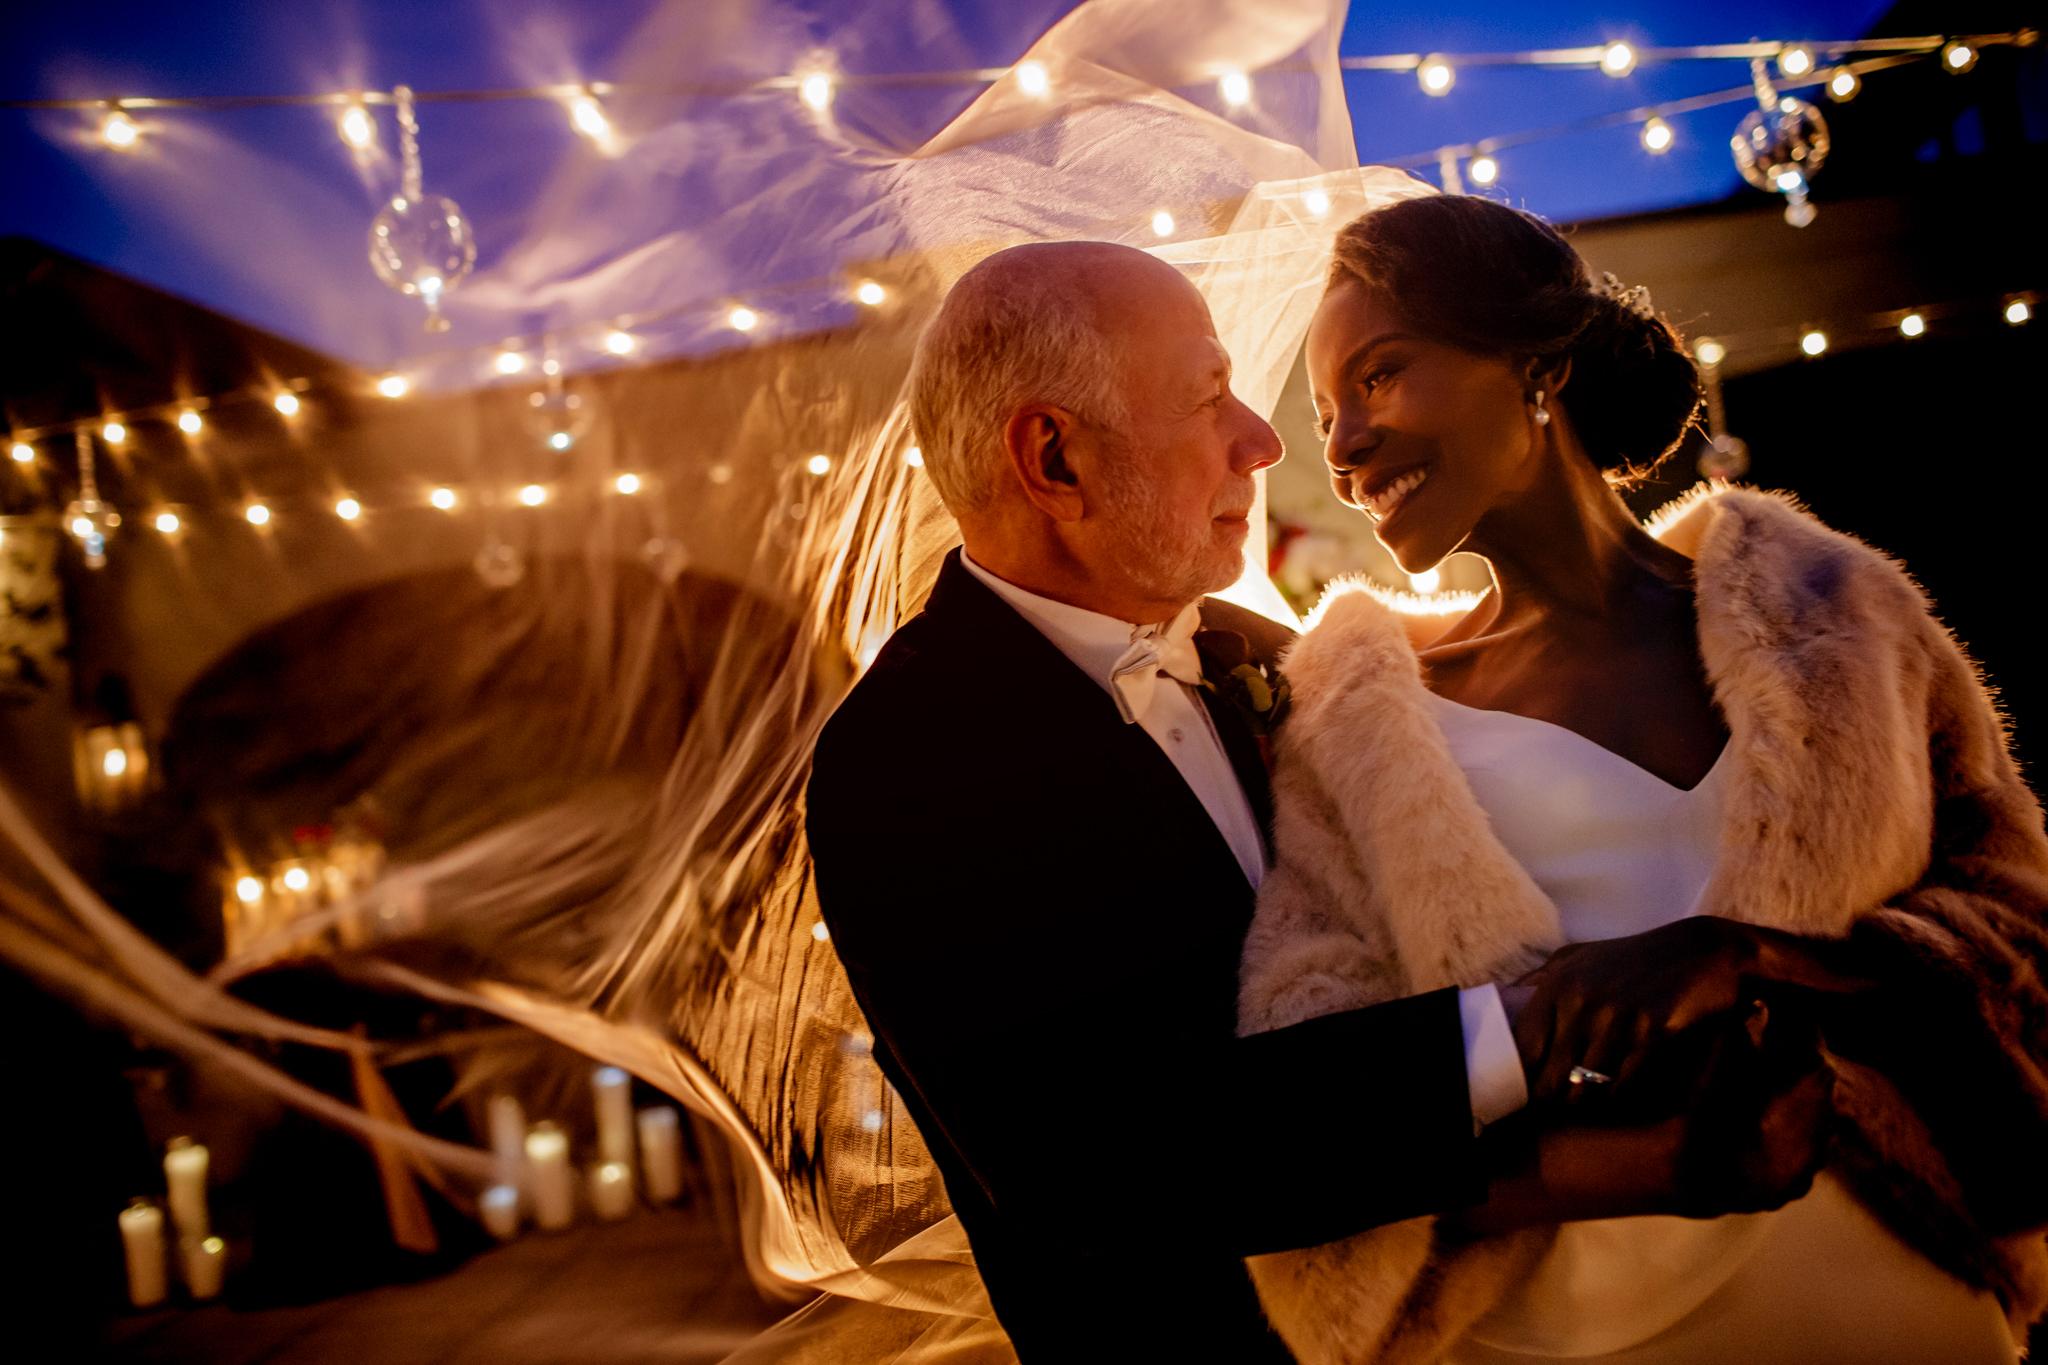 bride and groom romantic candlelit portrait- photo by Chrisman Studios